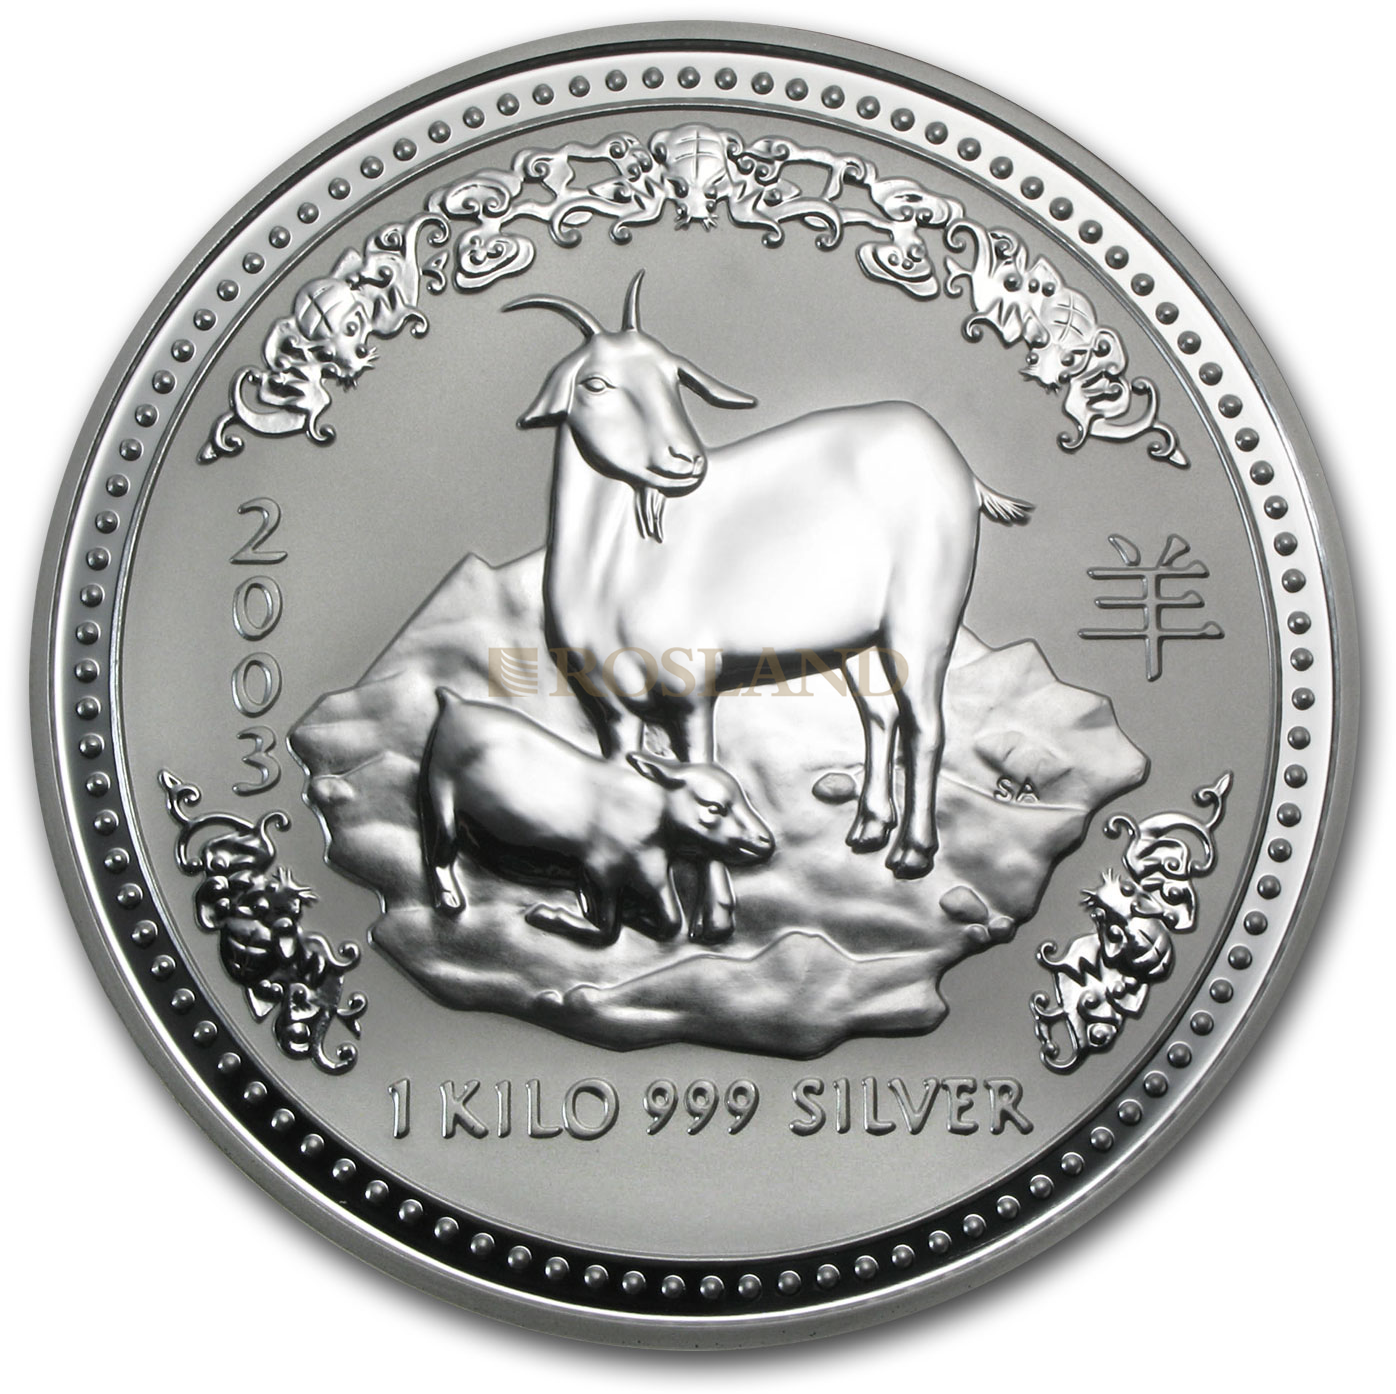 1 Kilogramm Silbermünze Australien Lunar 1 Ziege 2003